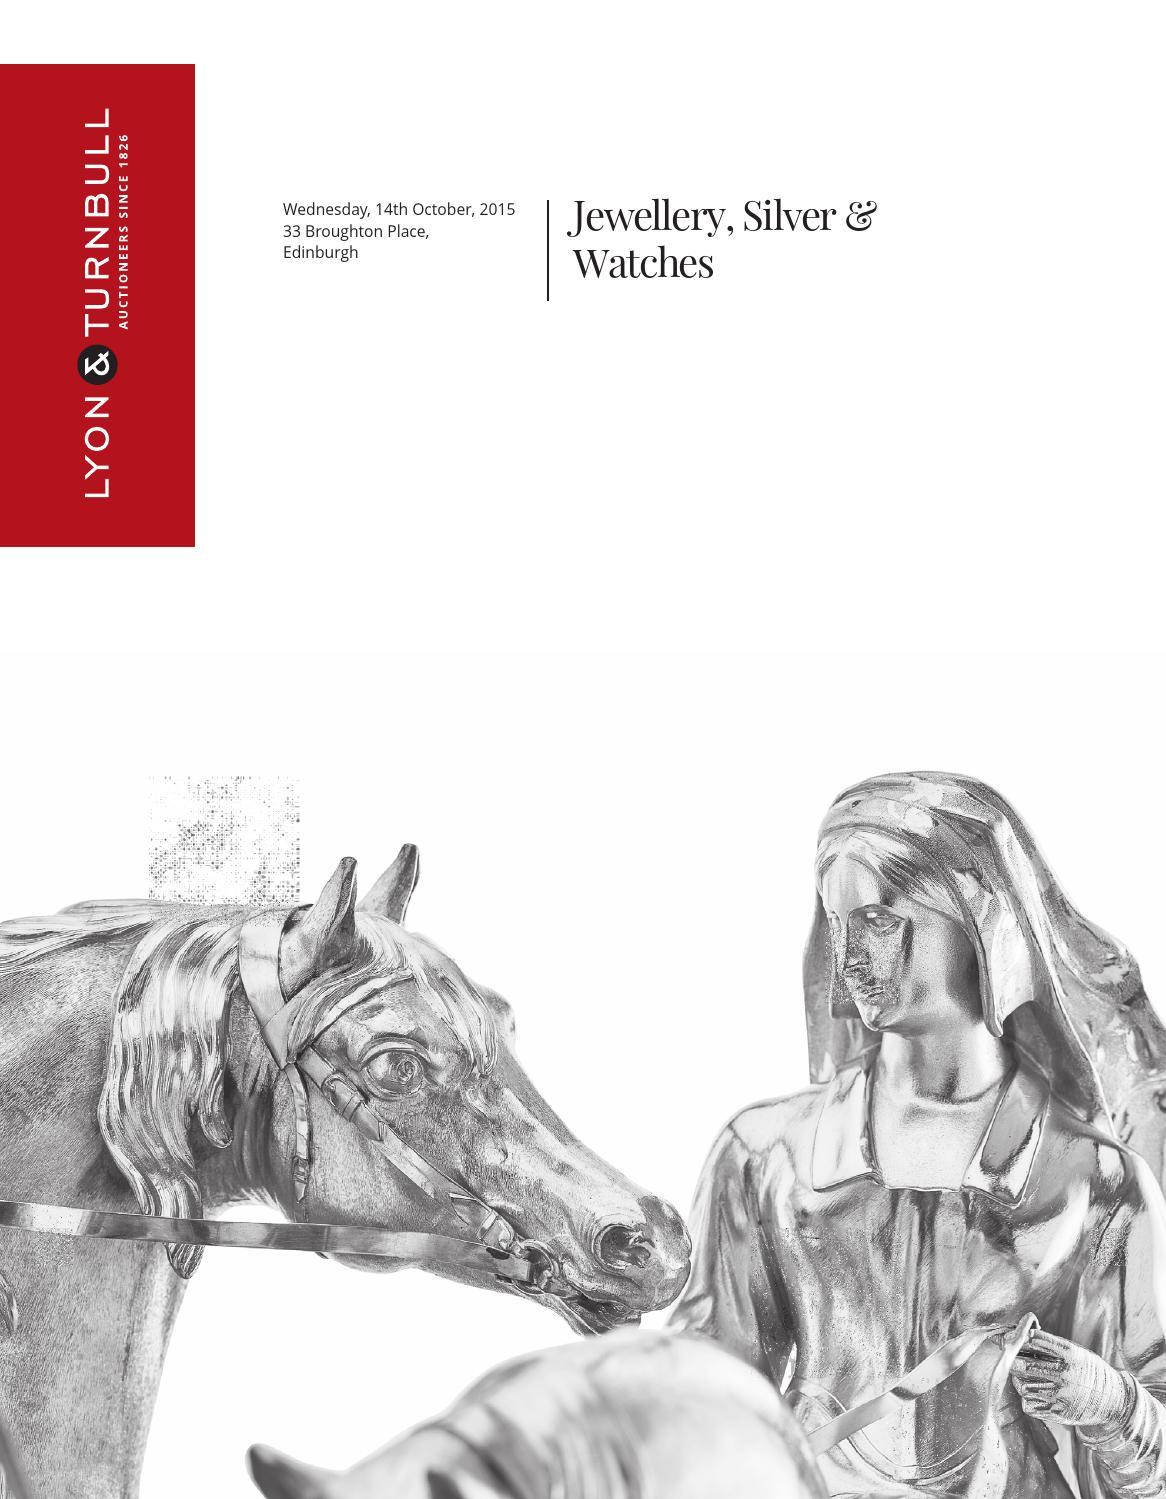 VINTAGE HORSE ANIMAL EQUESTRIAN WHEELER WM STERLING SILVER 925 PENDANT CHARM